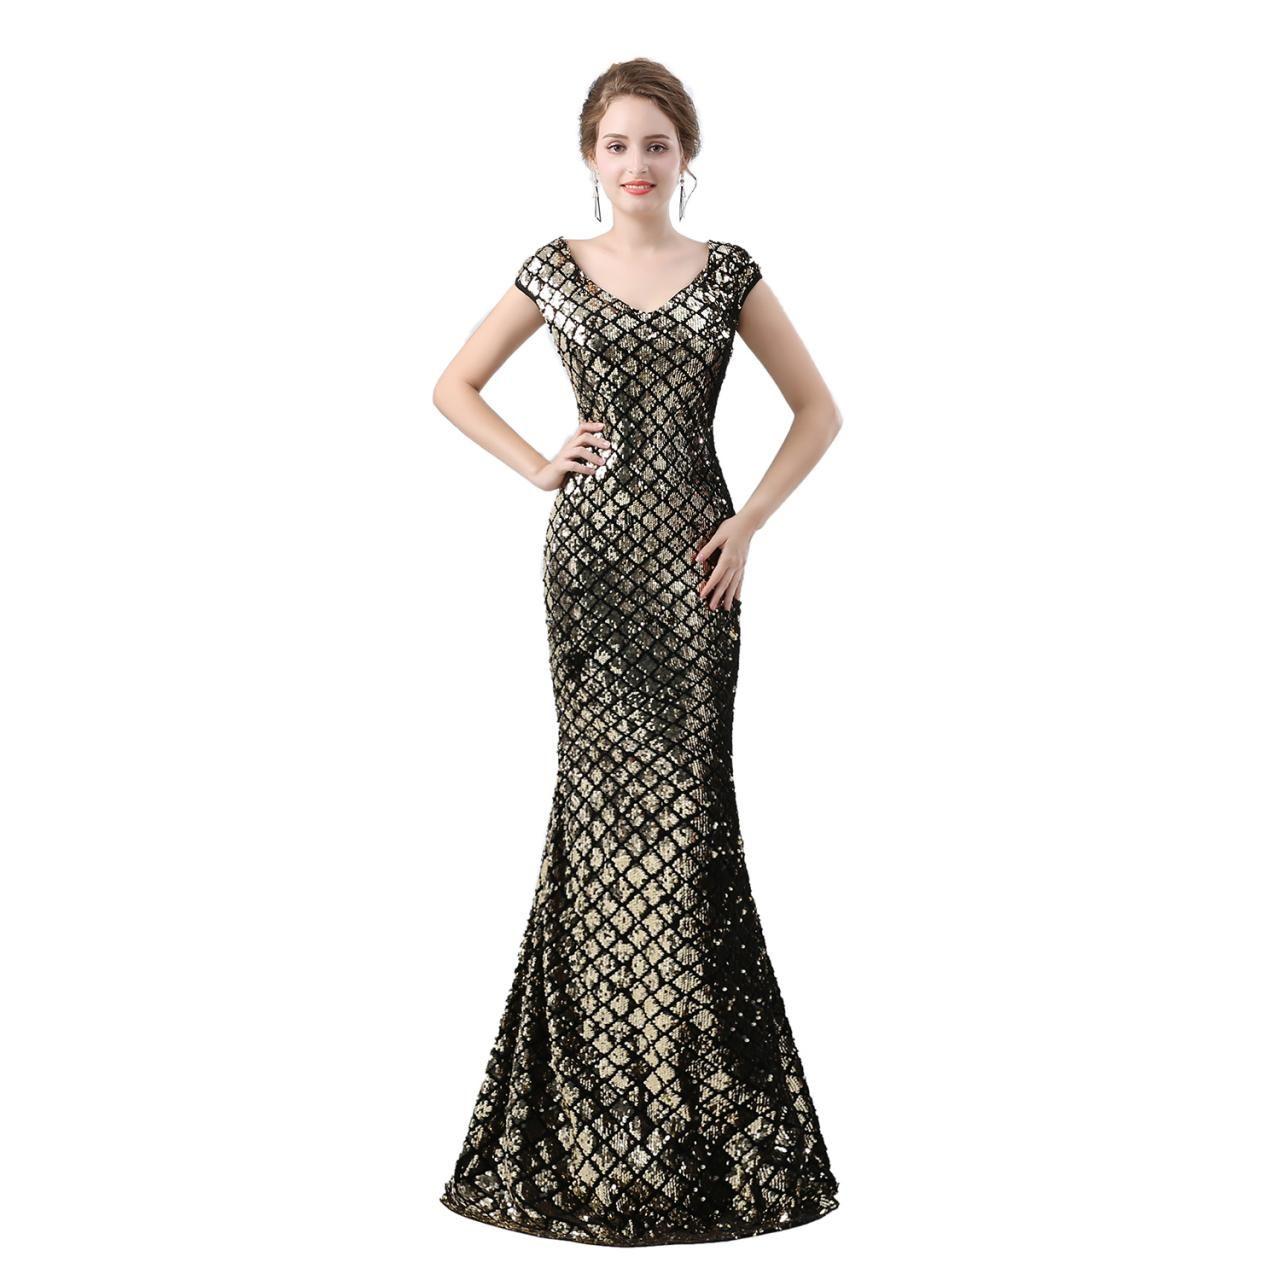 Prom dressgold prom dressmermaid prom dresseslong elegant prom